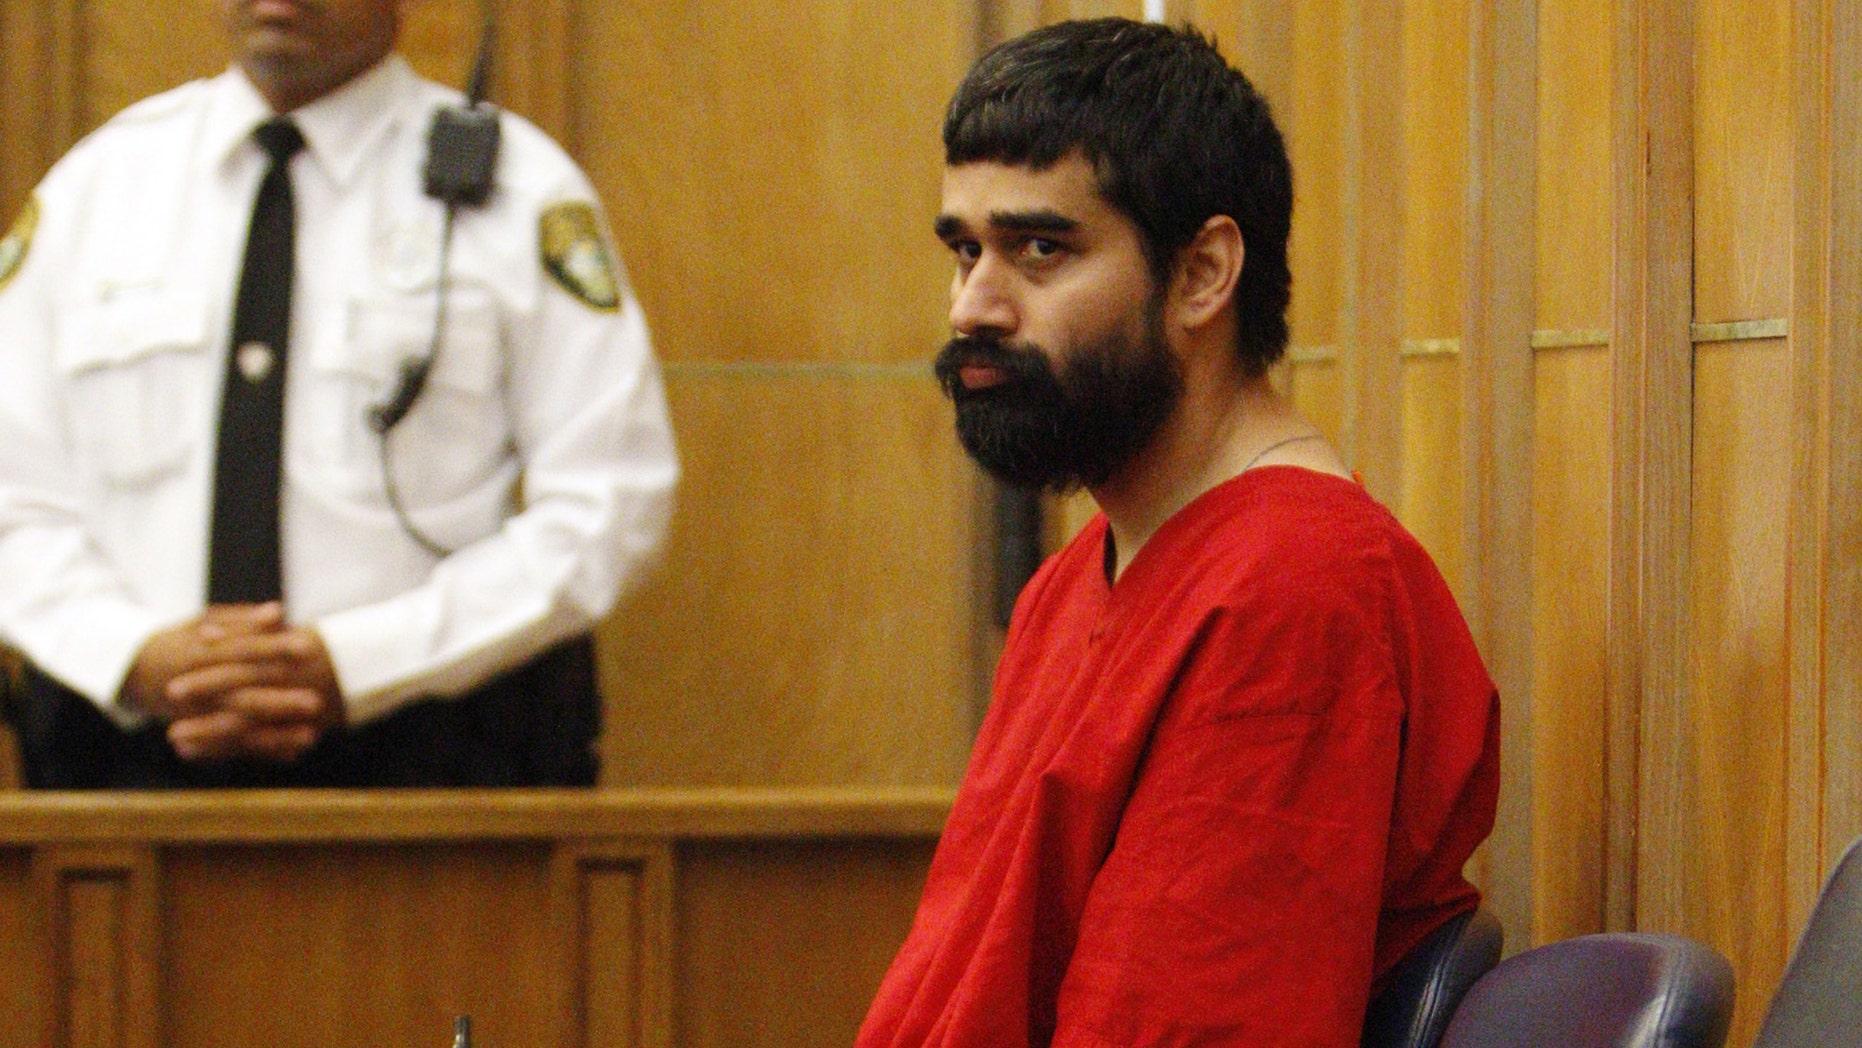 Derek Medina in court Tuesday, Oct. 15, 2013, during a bail hearing in Miami.